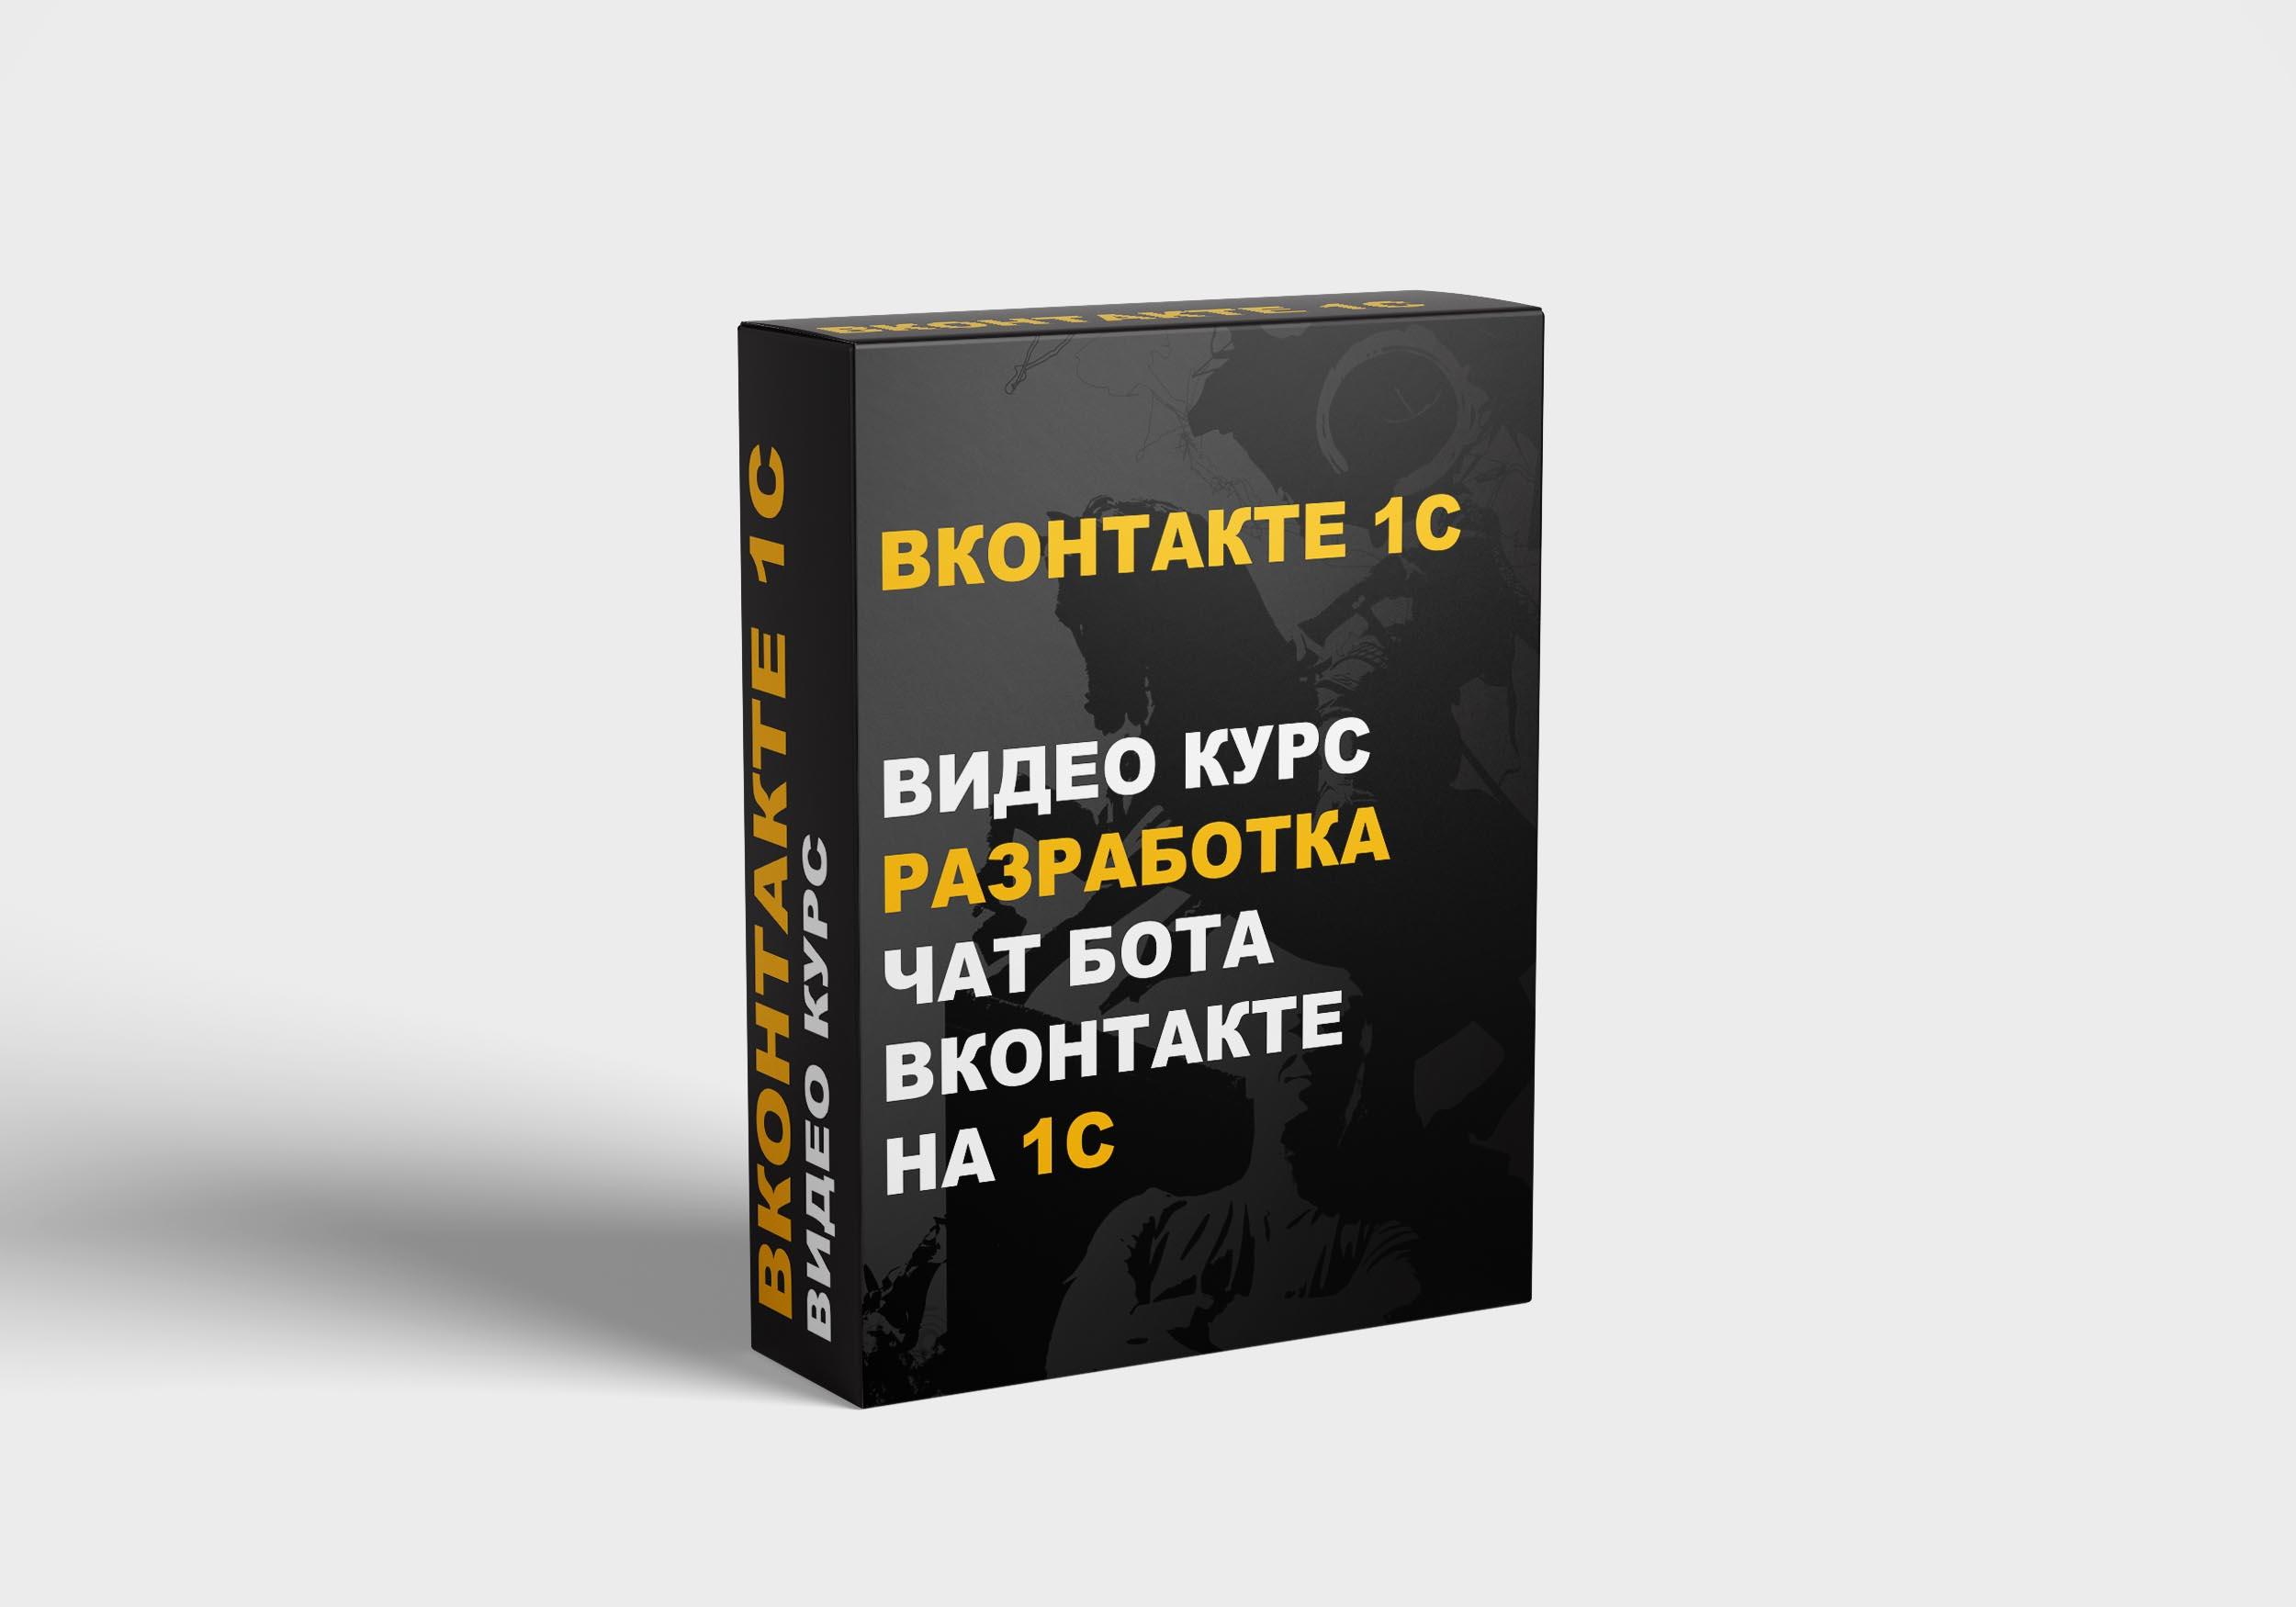 image https://store.turboconf.ru/Content/Files/72F2A601352EA026F5080AA30D3F131DA02943A2/Razrabotka-chat-bota-VKontakte.jpg